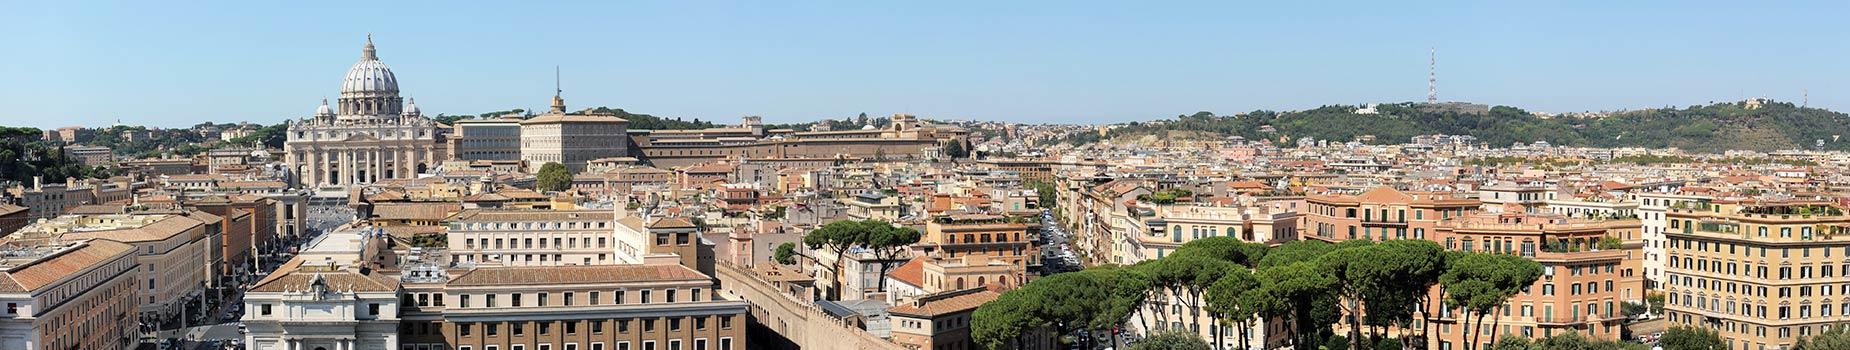 Busrondreis Rome